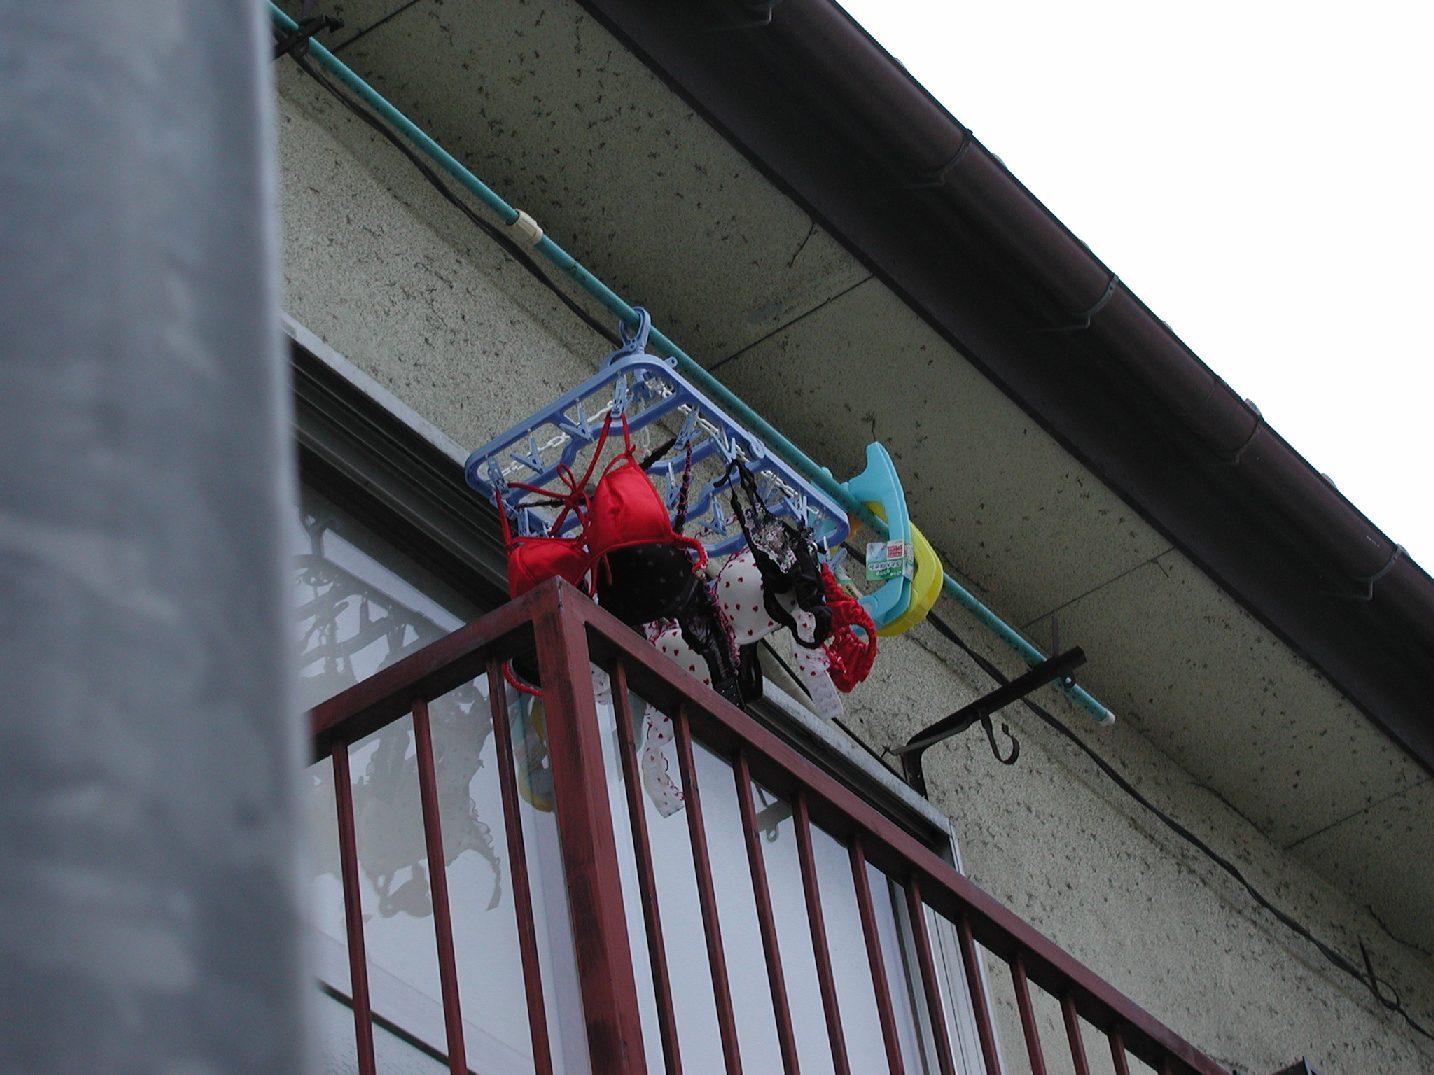 jkが住む新しく見つけた家のベランダの下着盗撮エロ画像2枚目